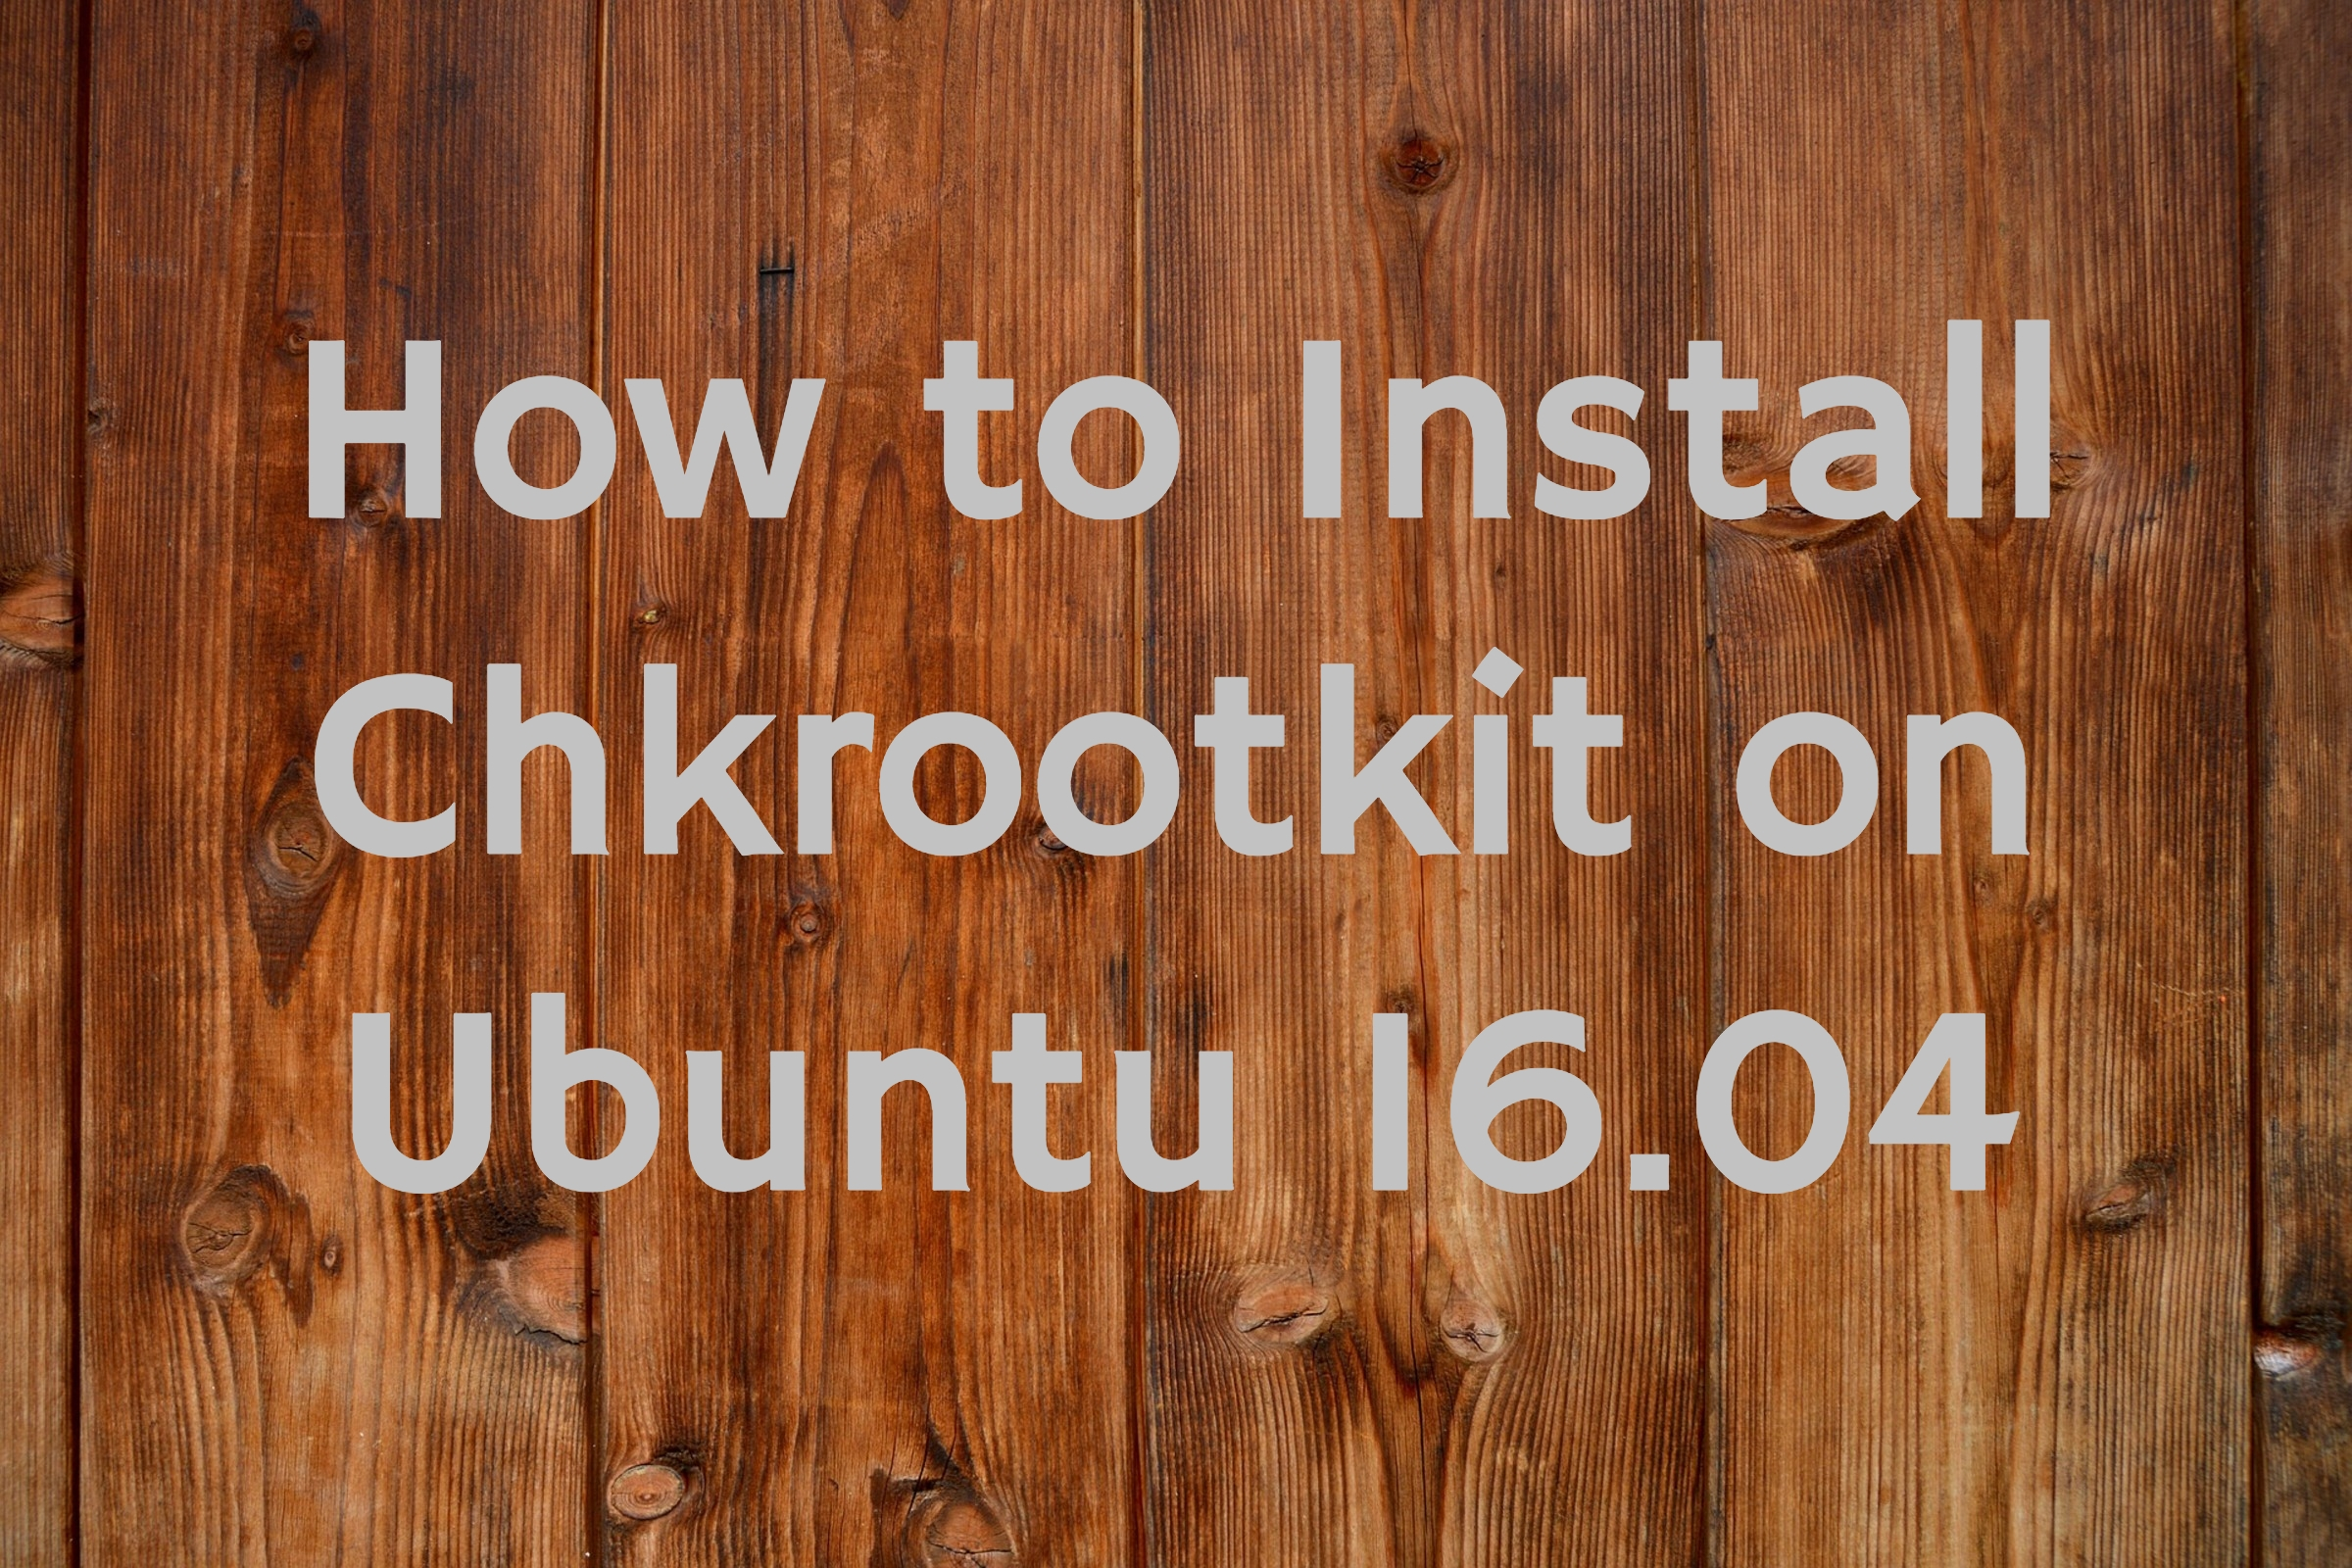 install chkrootkit ubuntu 16.04